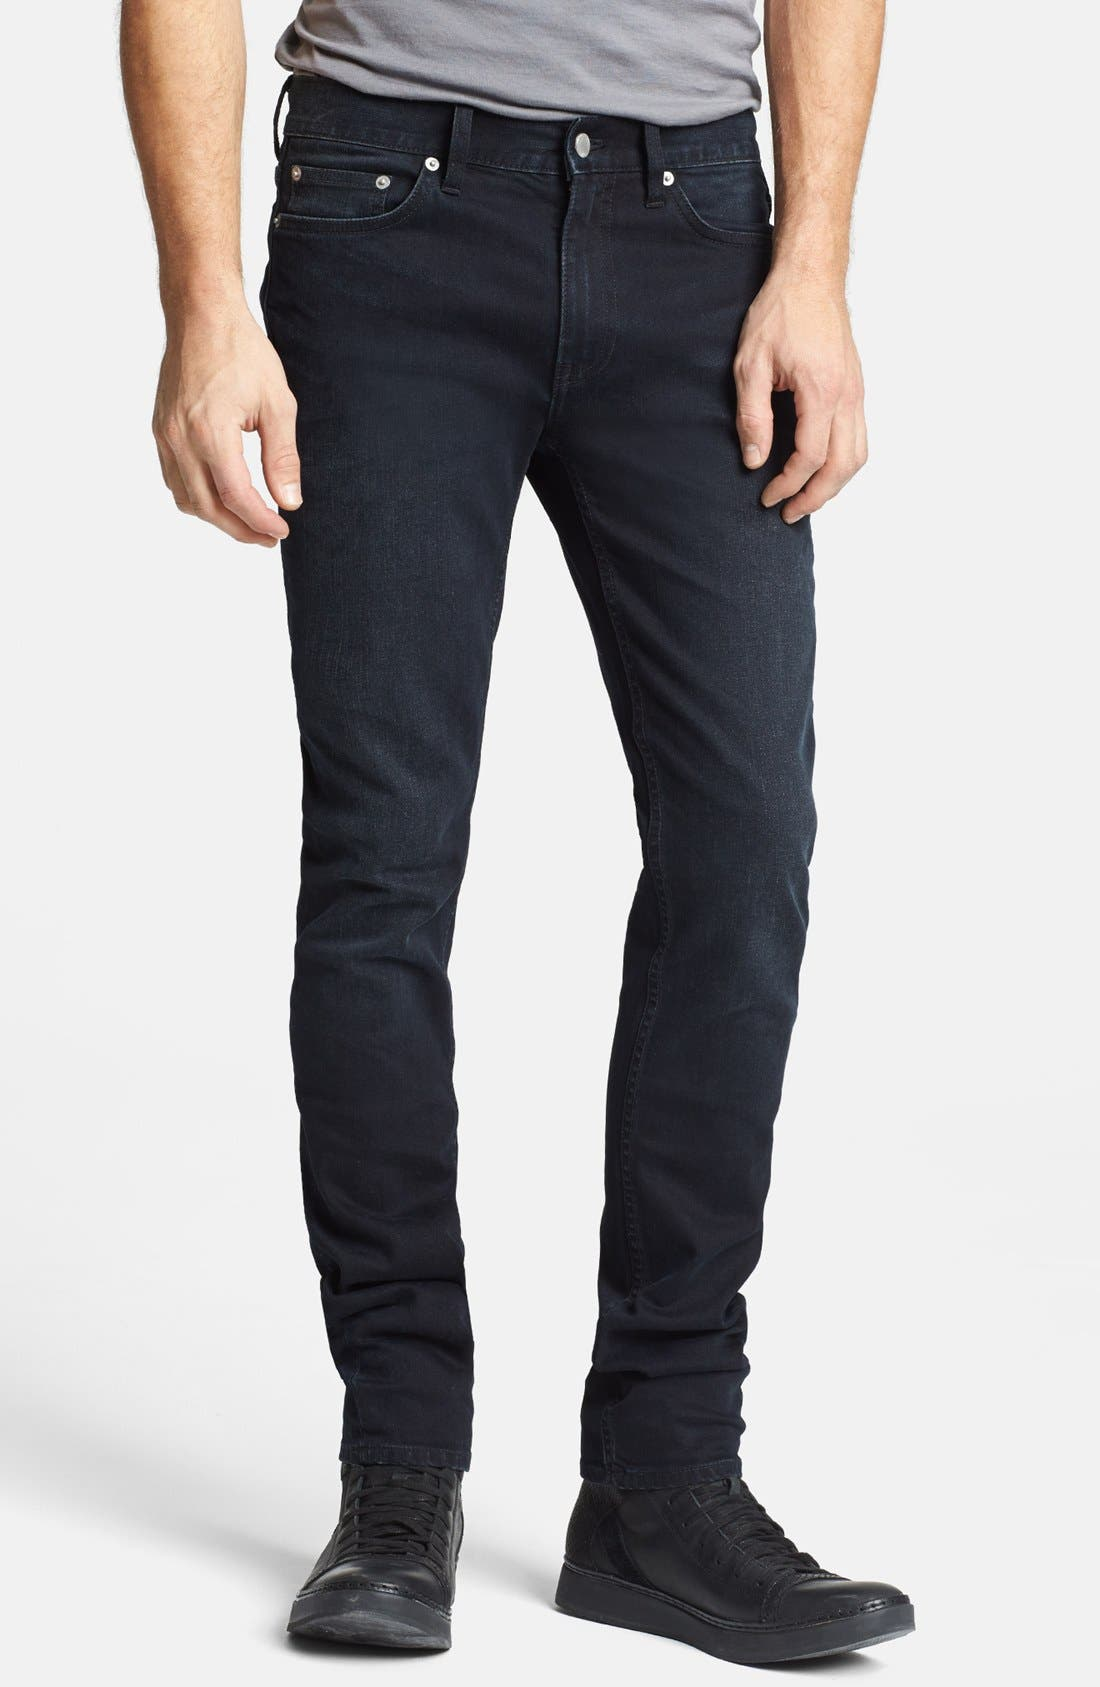 Main Image - BLK DNM 'Jeans 5' Slim Straight Leg Jeans (Beekman Black)